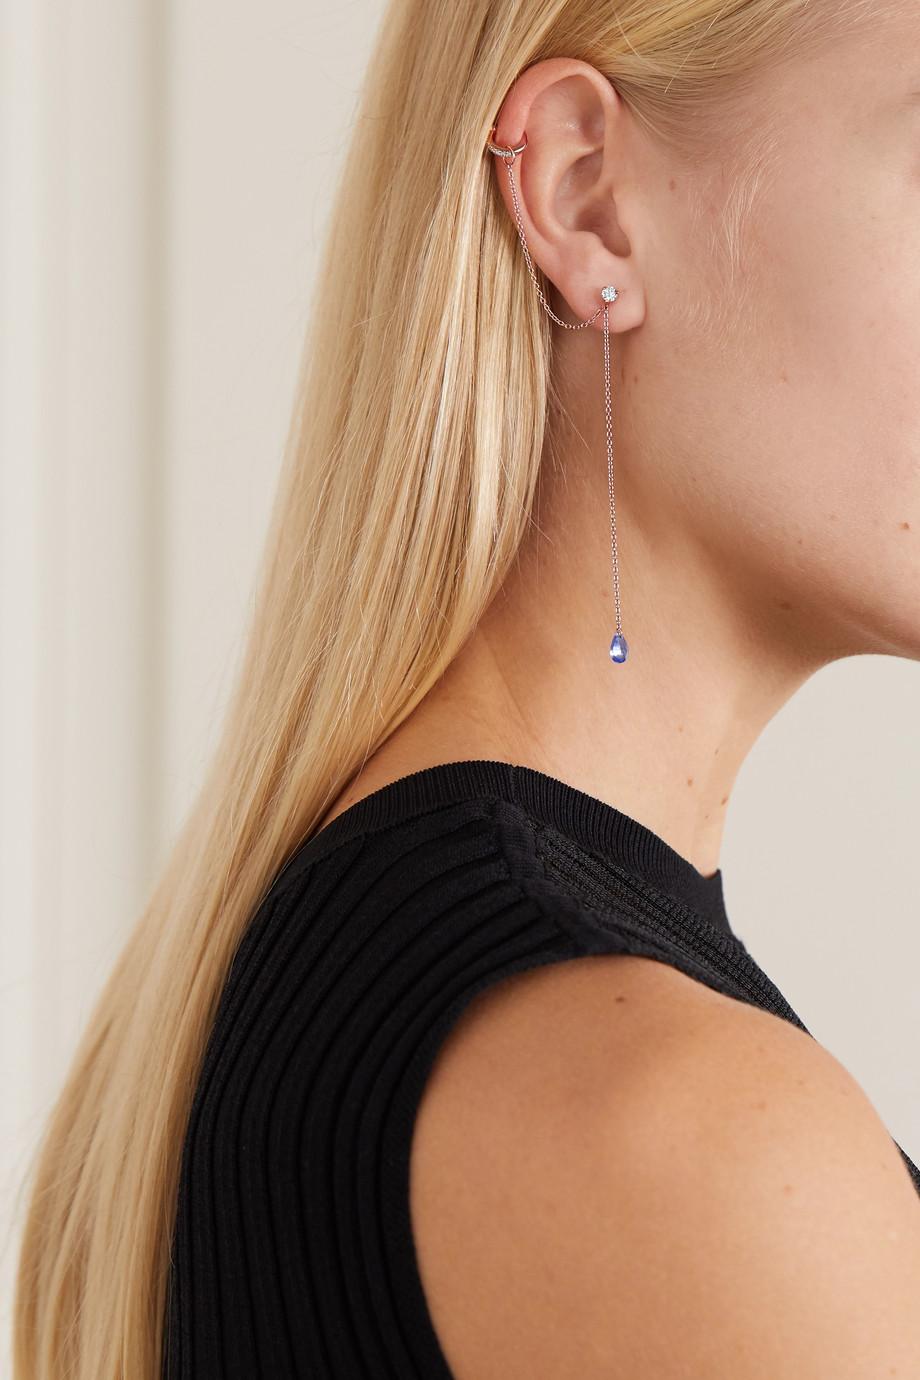 Diane Kordas 18-karat rose gold, sapphire and diamond earring